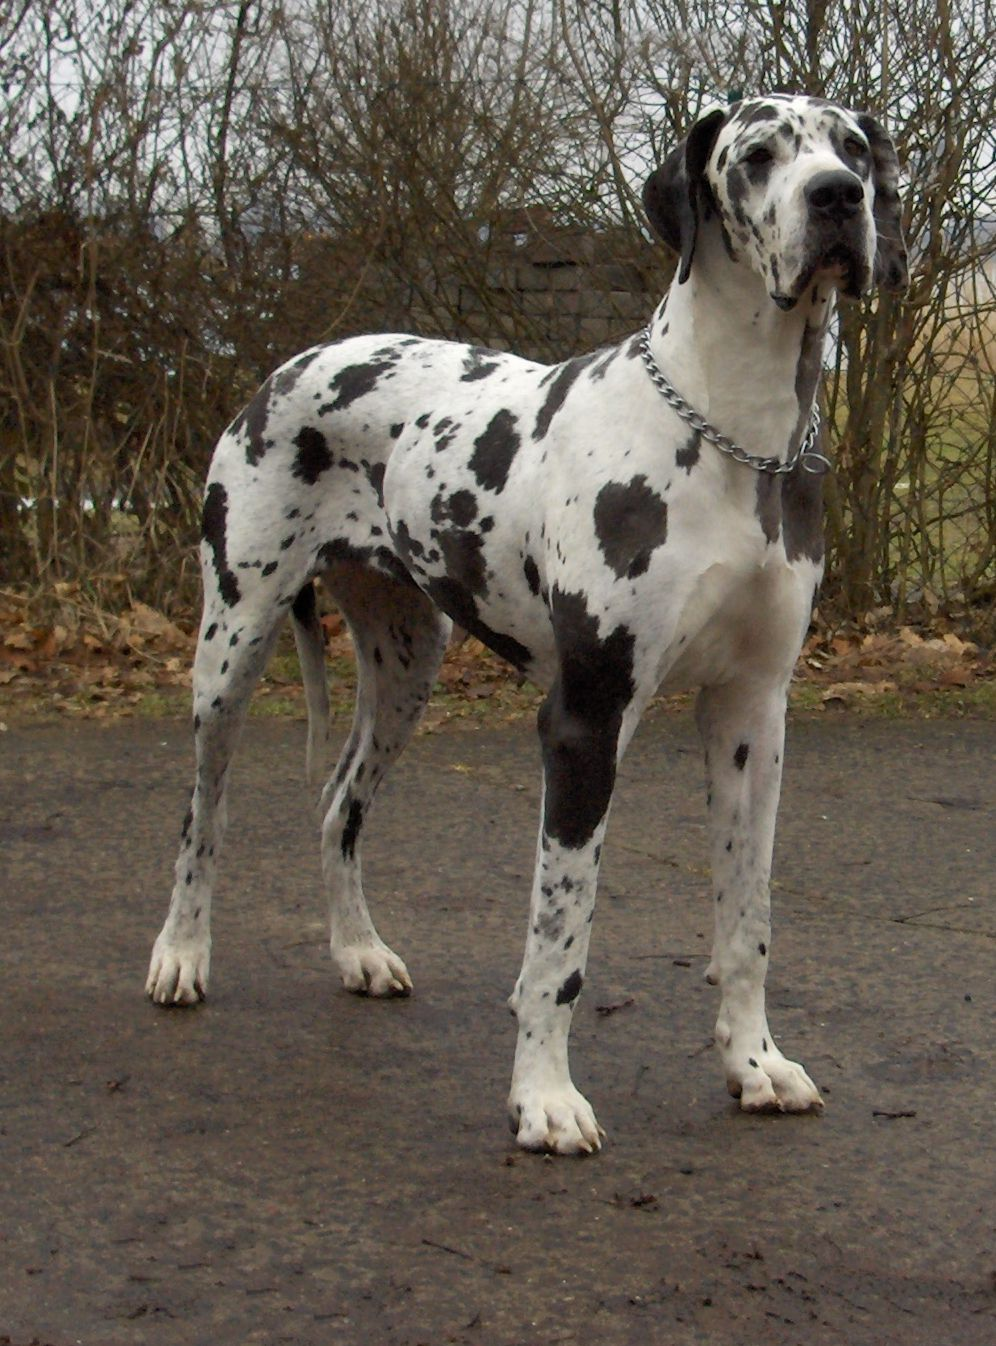 http://upload.wikimedia.org/wikipedia/commons/e/e5/Dogge_Odin.jpg